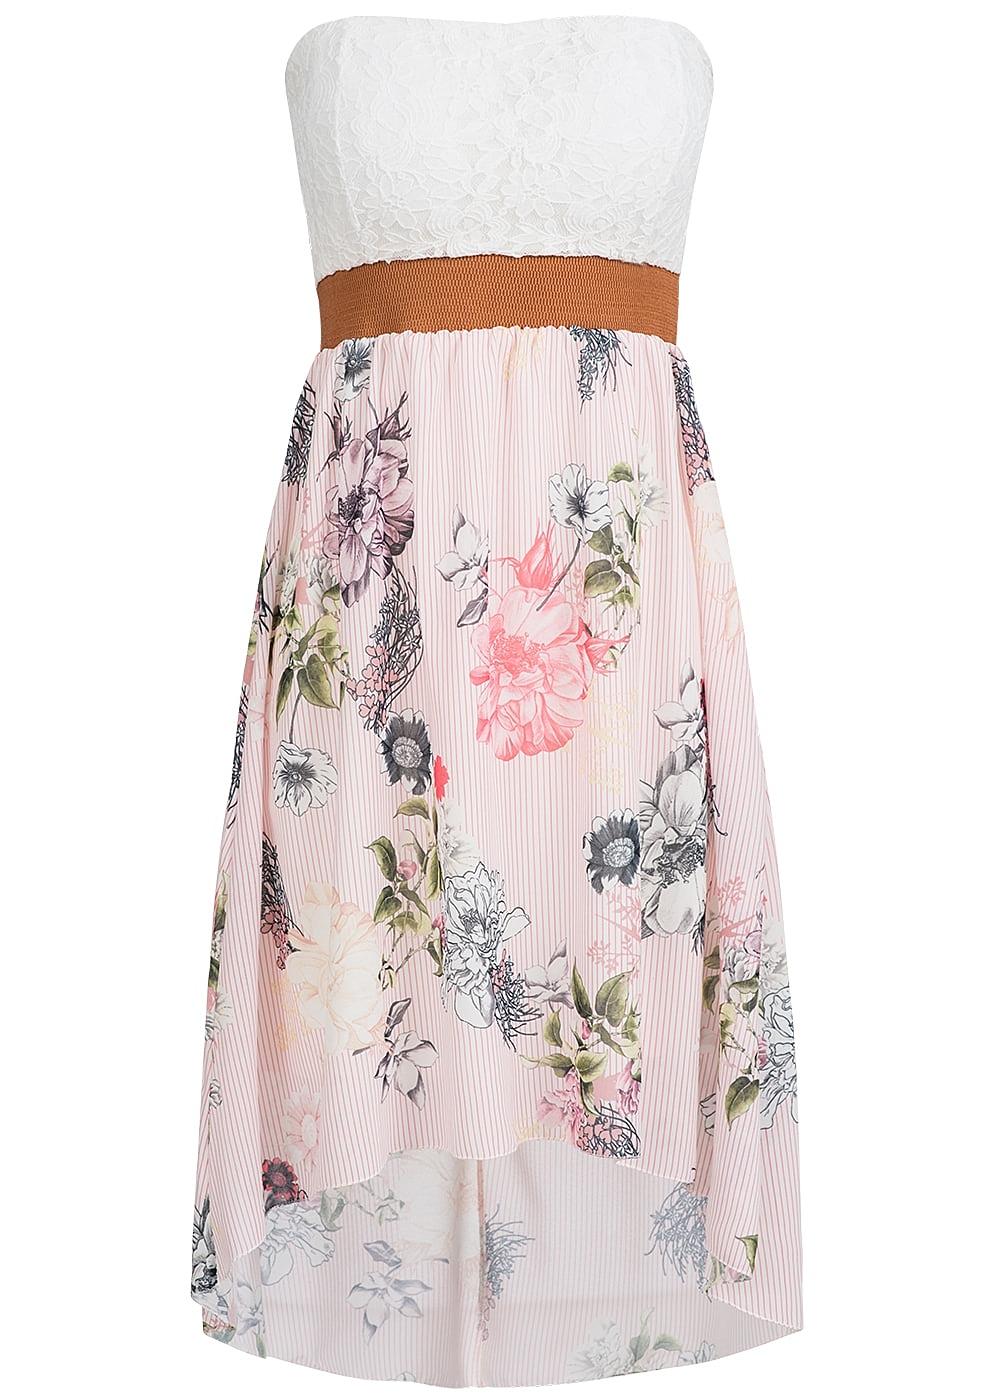 styleboom fashion damen mini bandeau kleid blumen muster spitze brustpads rosa weiss br. Black Bedroom Furniture Sets. Home Design Ideas